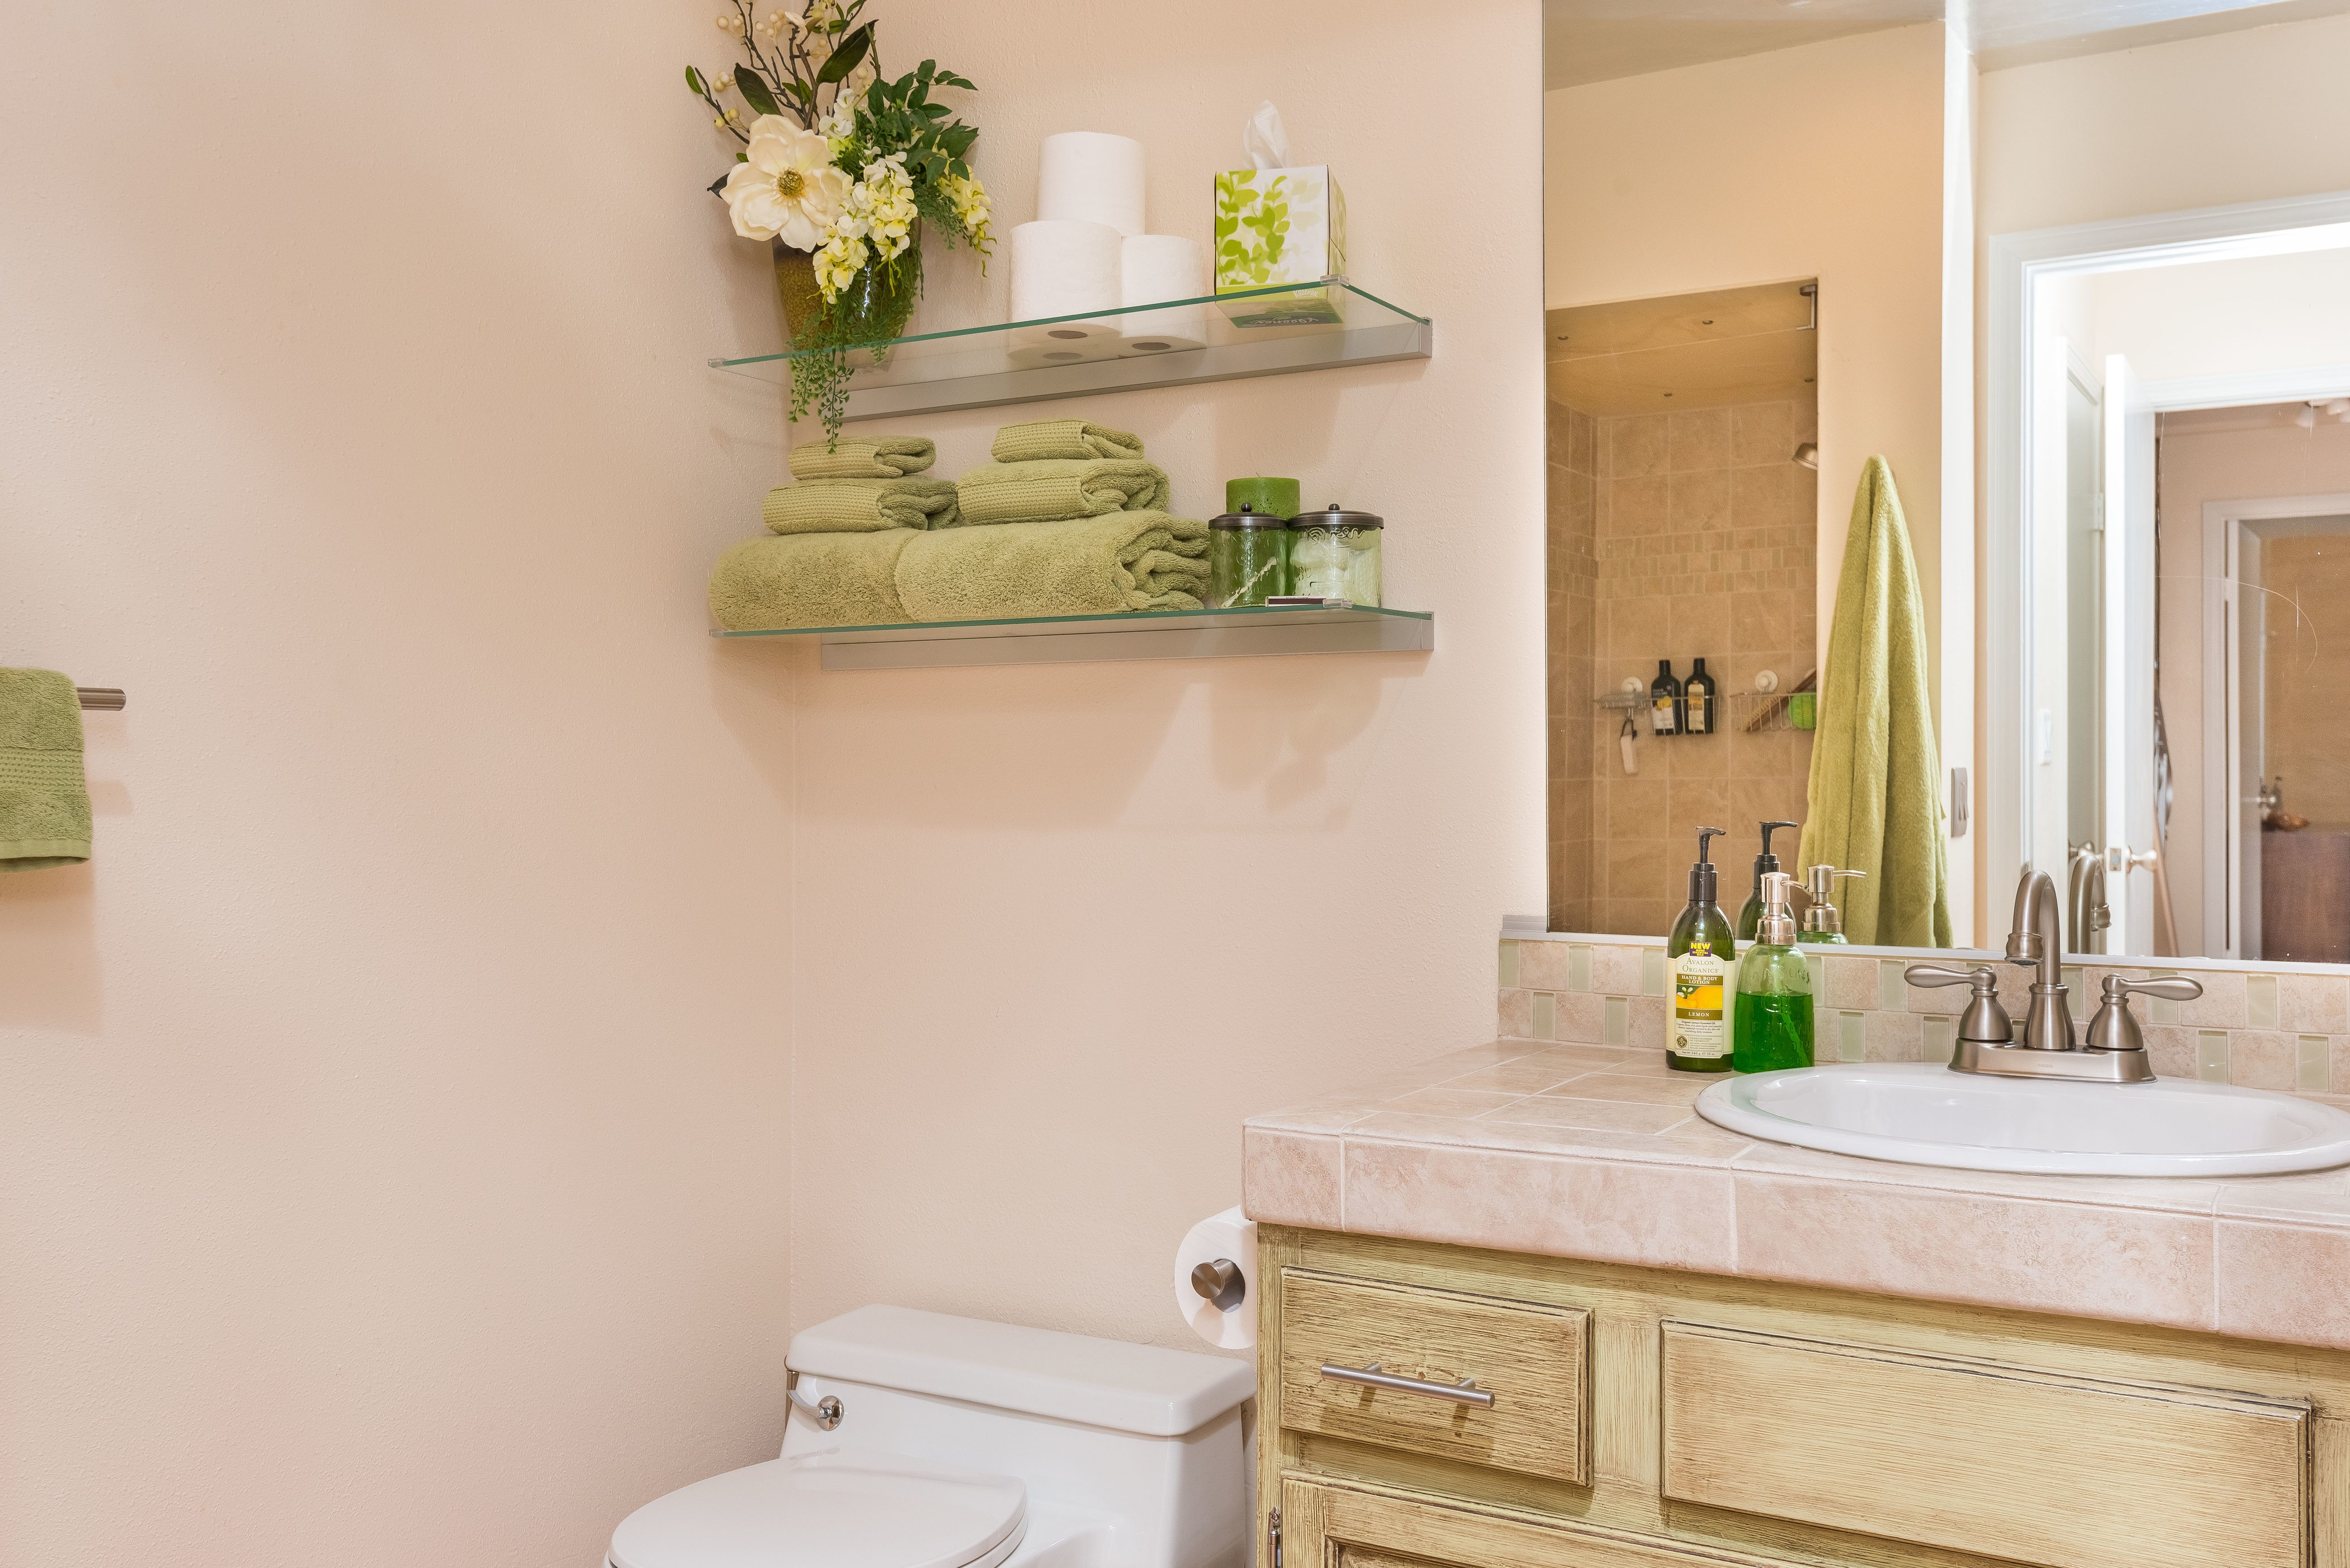 Additional photo for property listing at 3747 Keating St  圣地亚哥, 加利福尼亚州 92110 美国